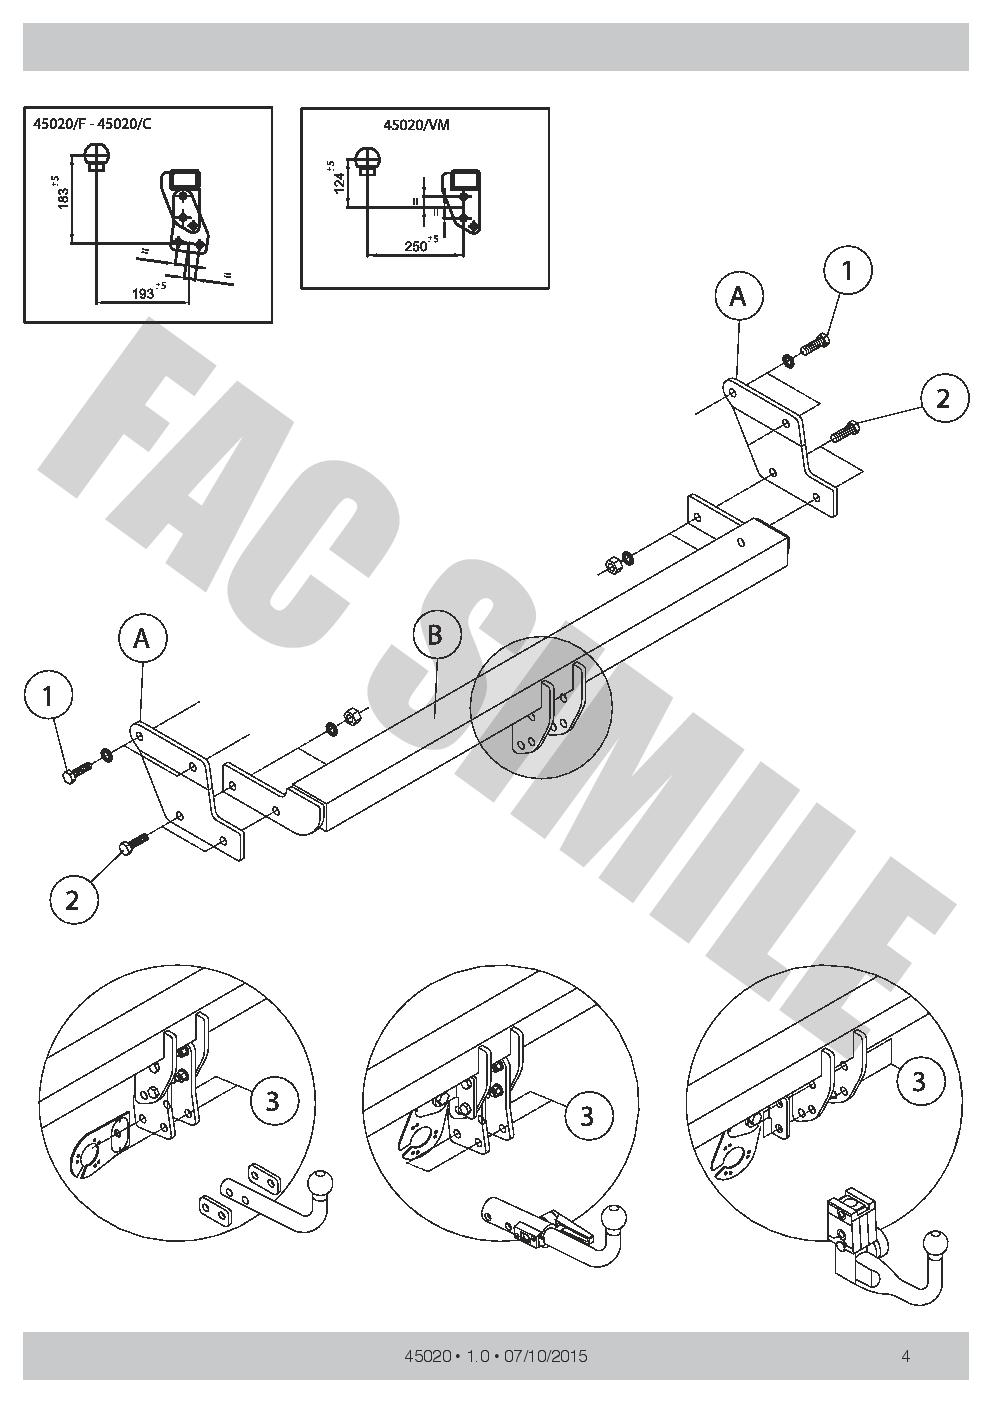 Vertical Towbar 7p Bypass Relay For Hyundai I20 Hatch 3 5dr 09 12 Wiring Diagram